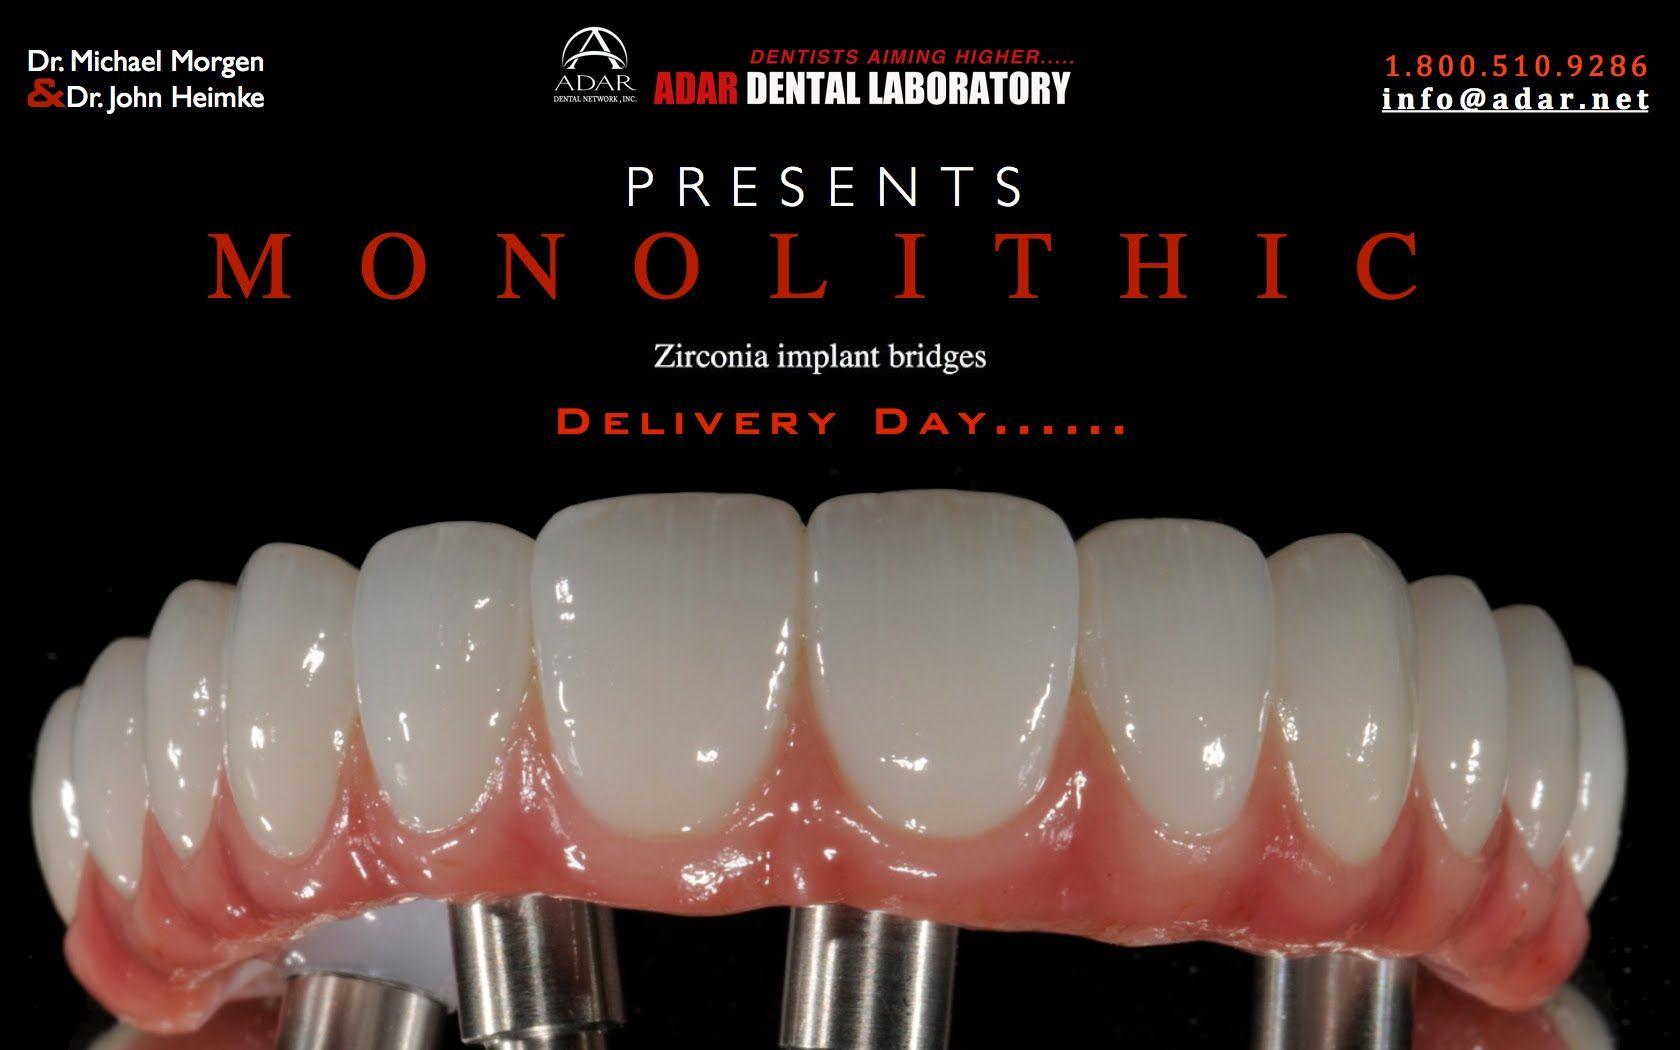 All On 4 Zirconia Hybrid Implant Bridge Delivery Day Info Adar Net Mini Dental Implants Dental Implants Cost Dental Bridge